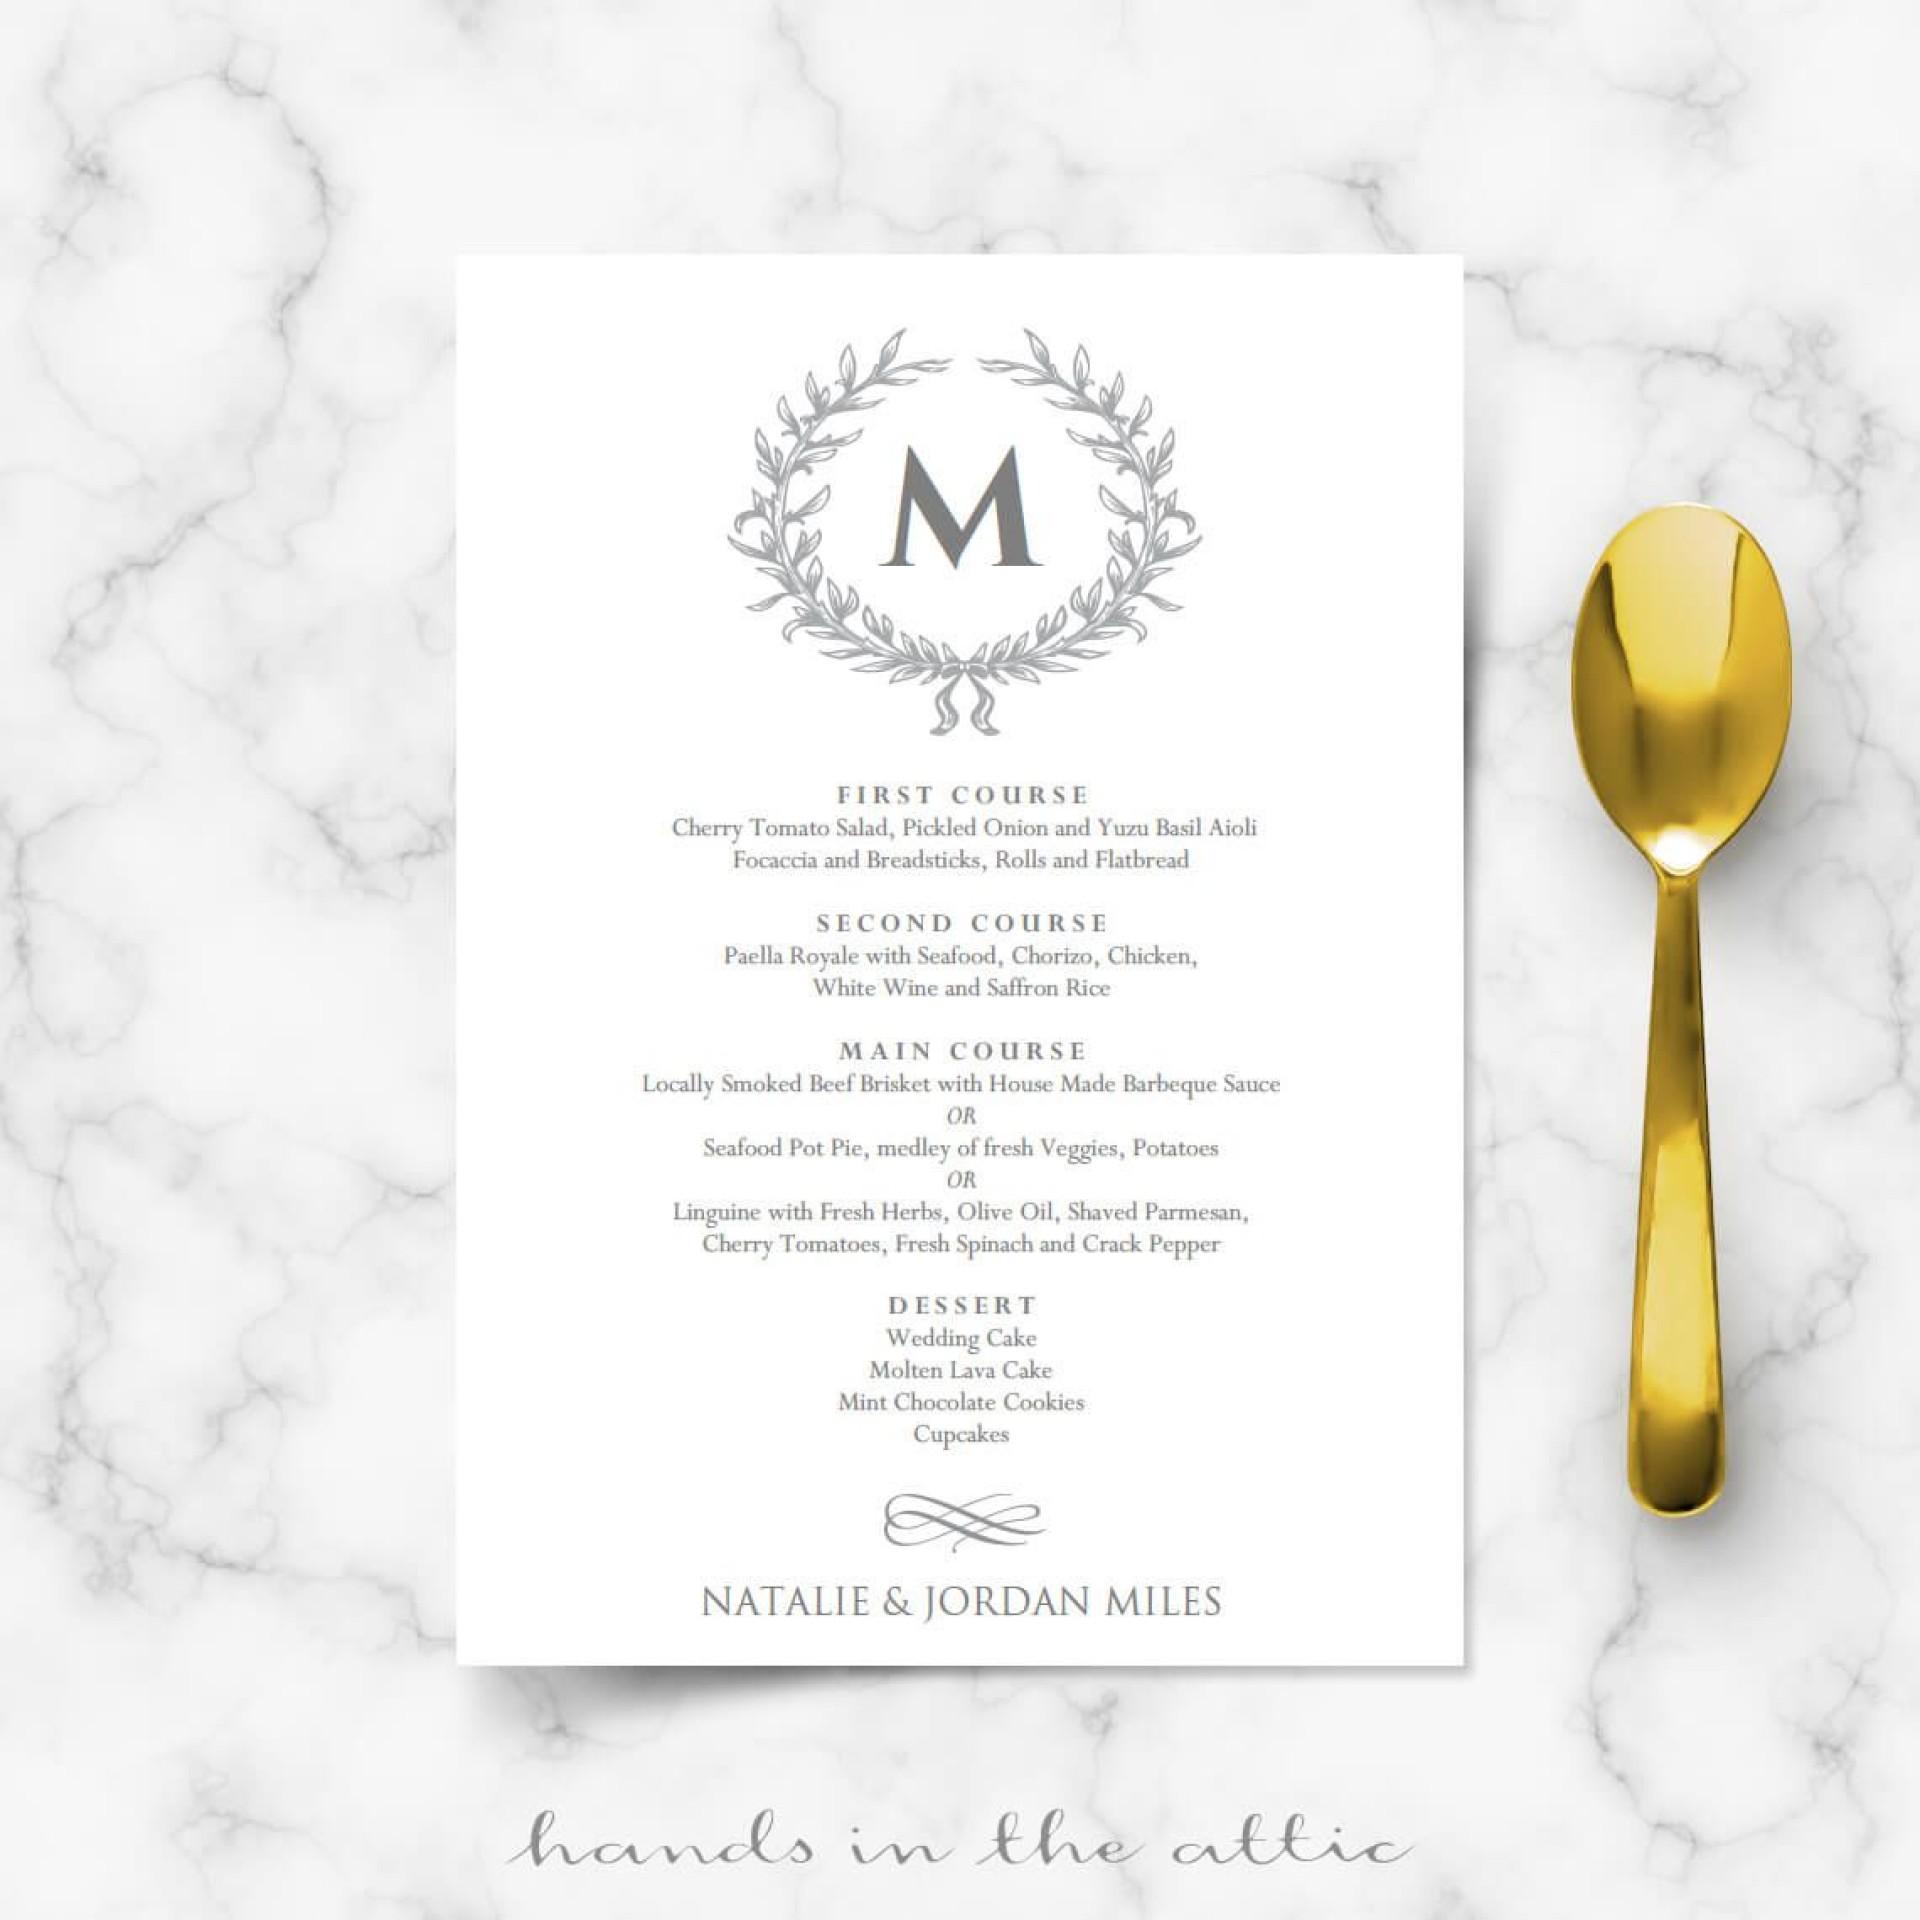 005 Formidable Elegant Wedding Menu Card Template Inspiration  Templates1920